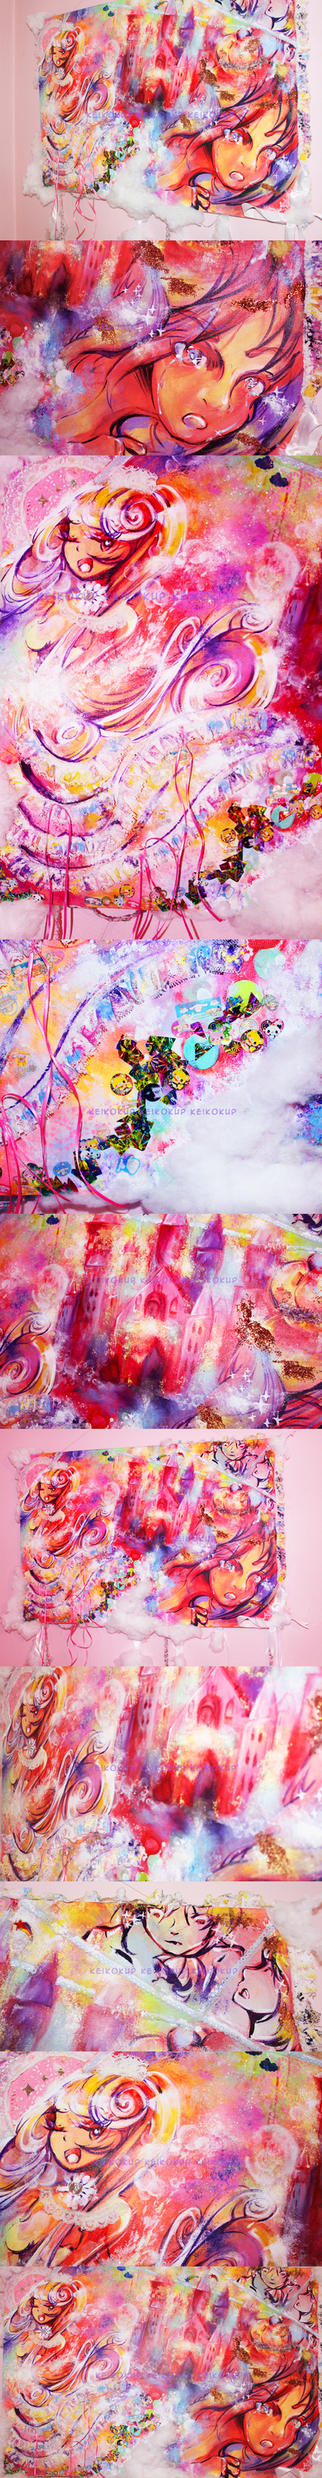 Cotton Candy Kiseki by KeikoKup